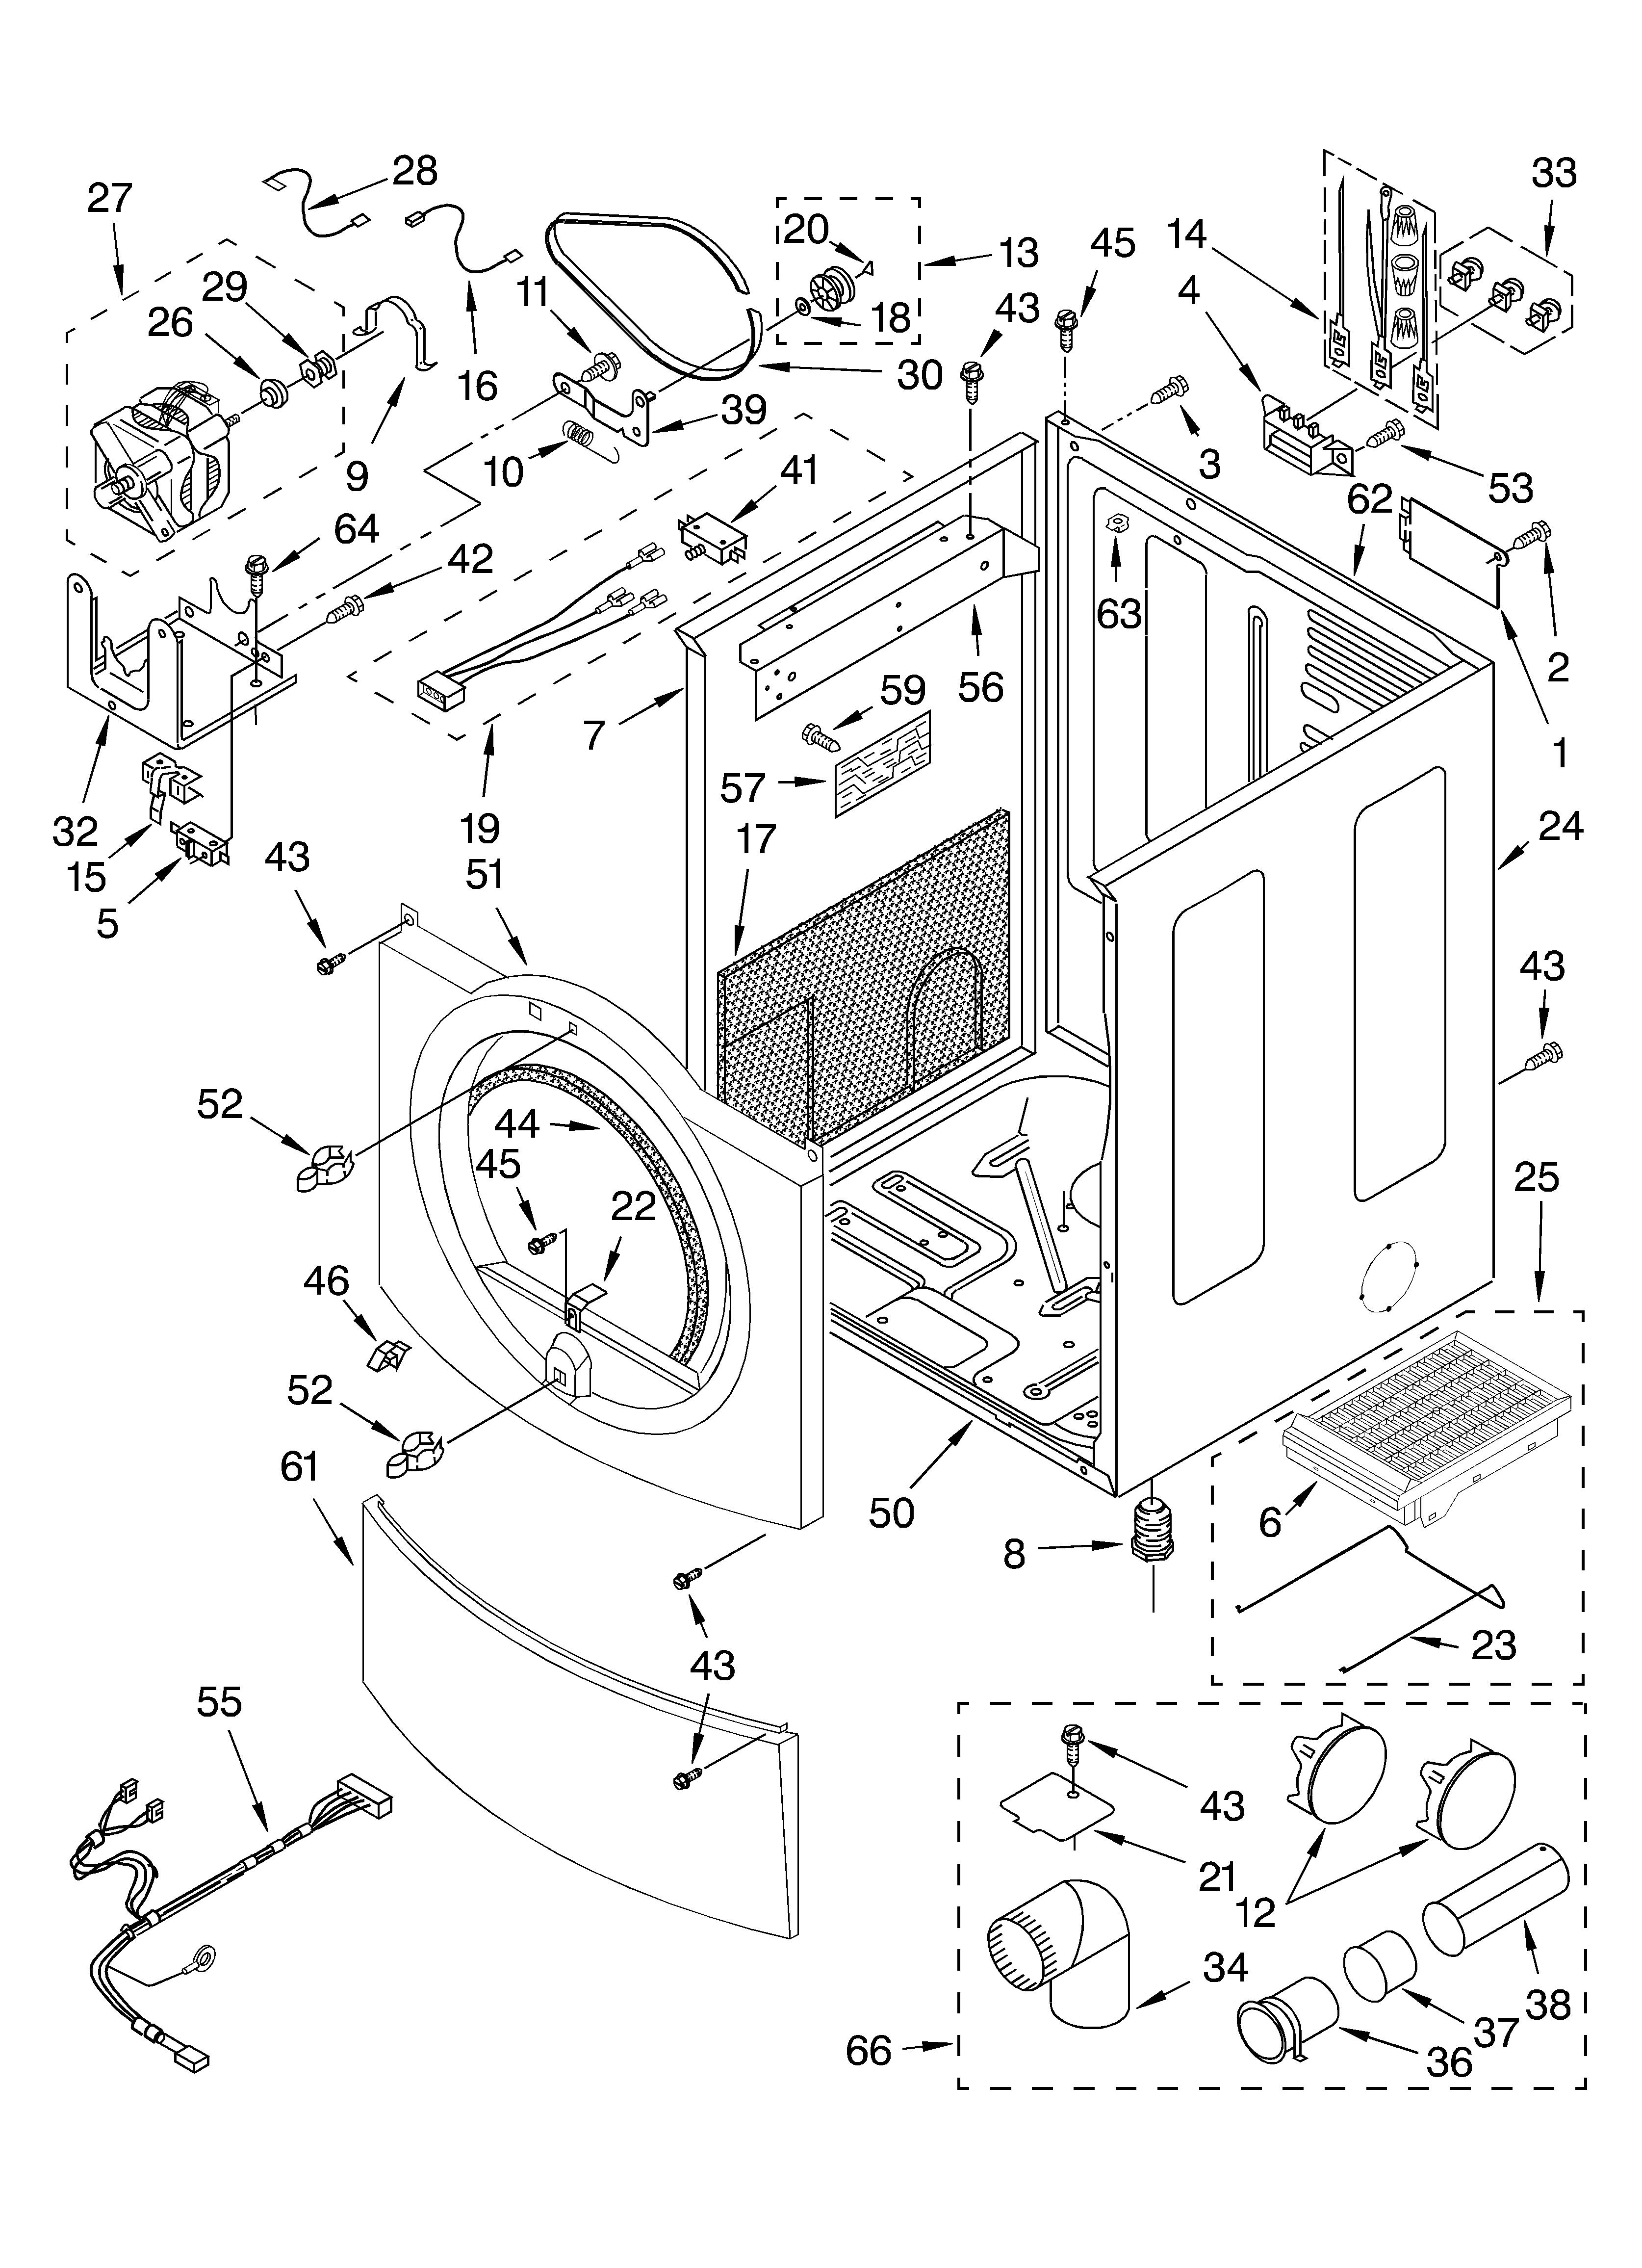 Whirlpool Dryer Wiring Diagram Manual | Wiring Diagram - Whirlpool Dryer Wiring Diagram